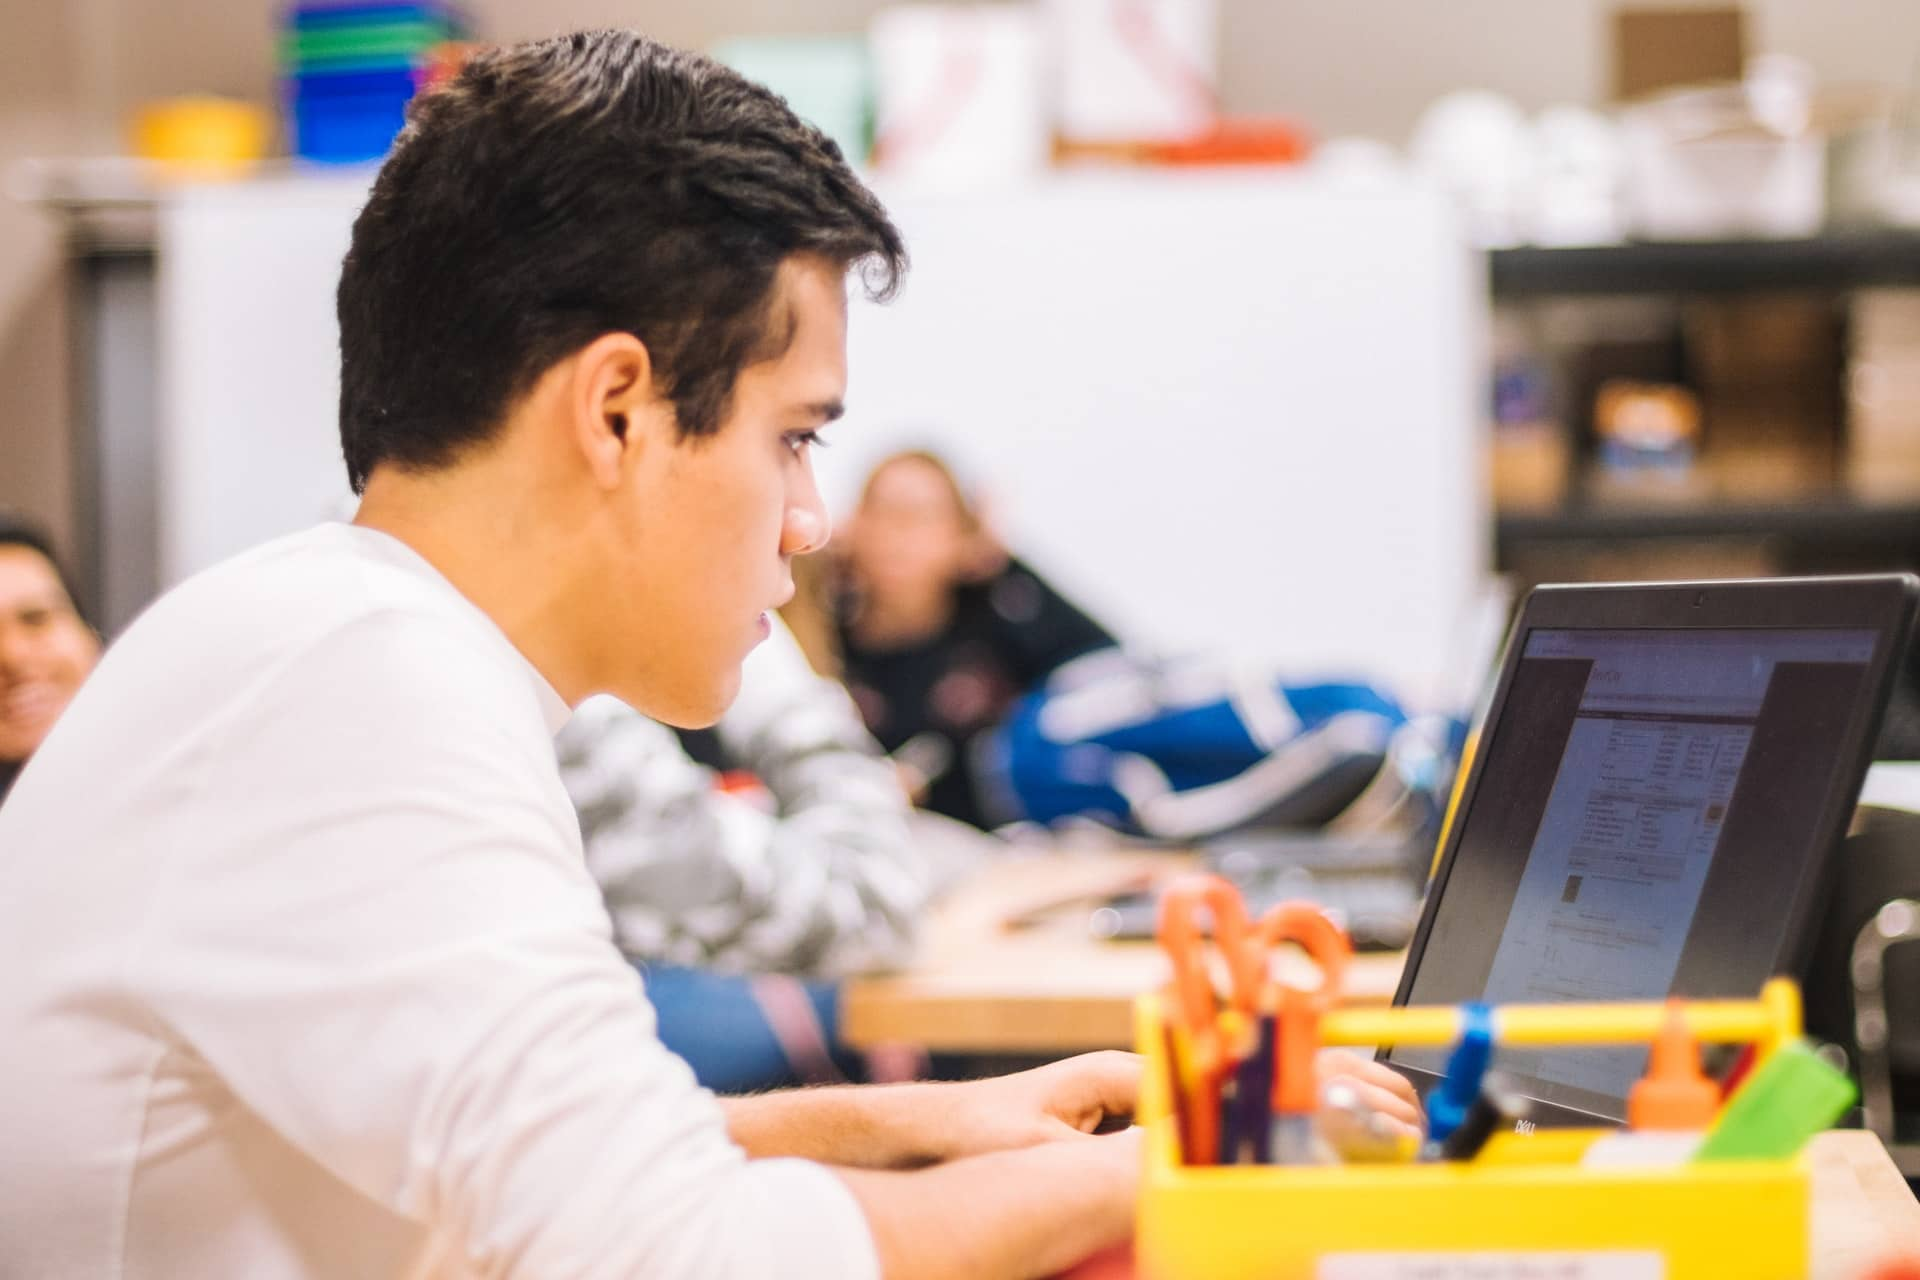 boy focused on laptop screen